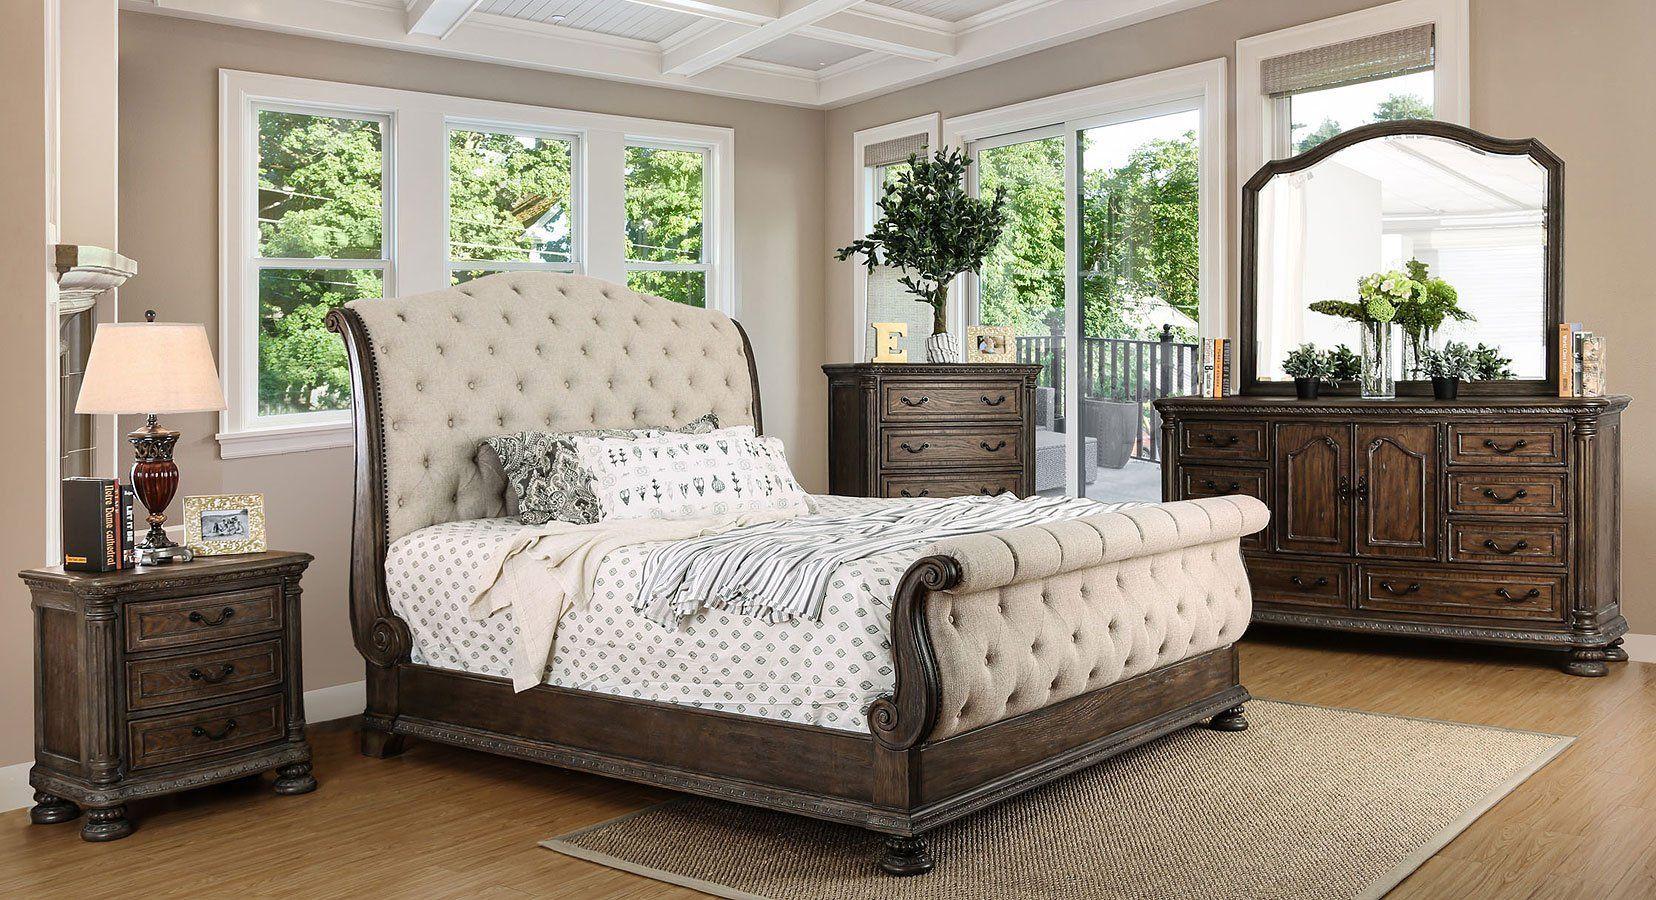 Lysandra Sleigh Bedroom Set Sleigh bedroom set, Bed